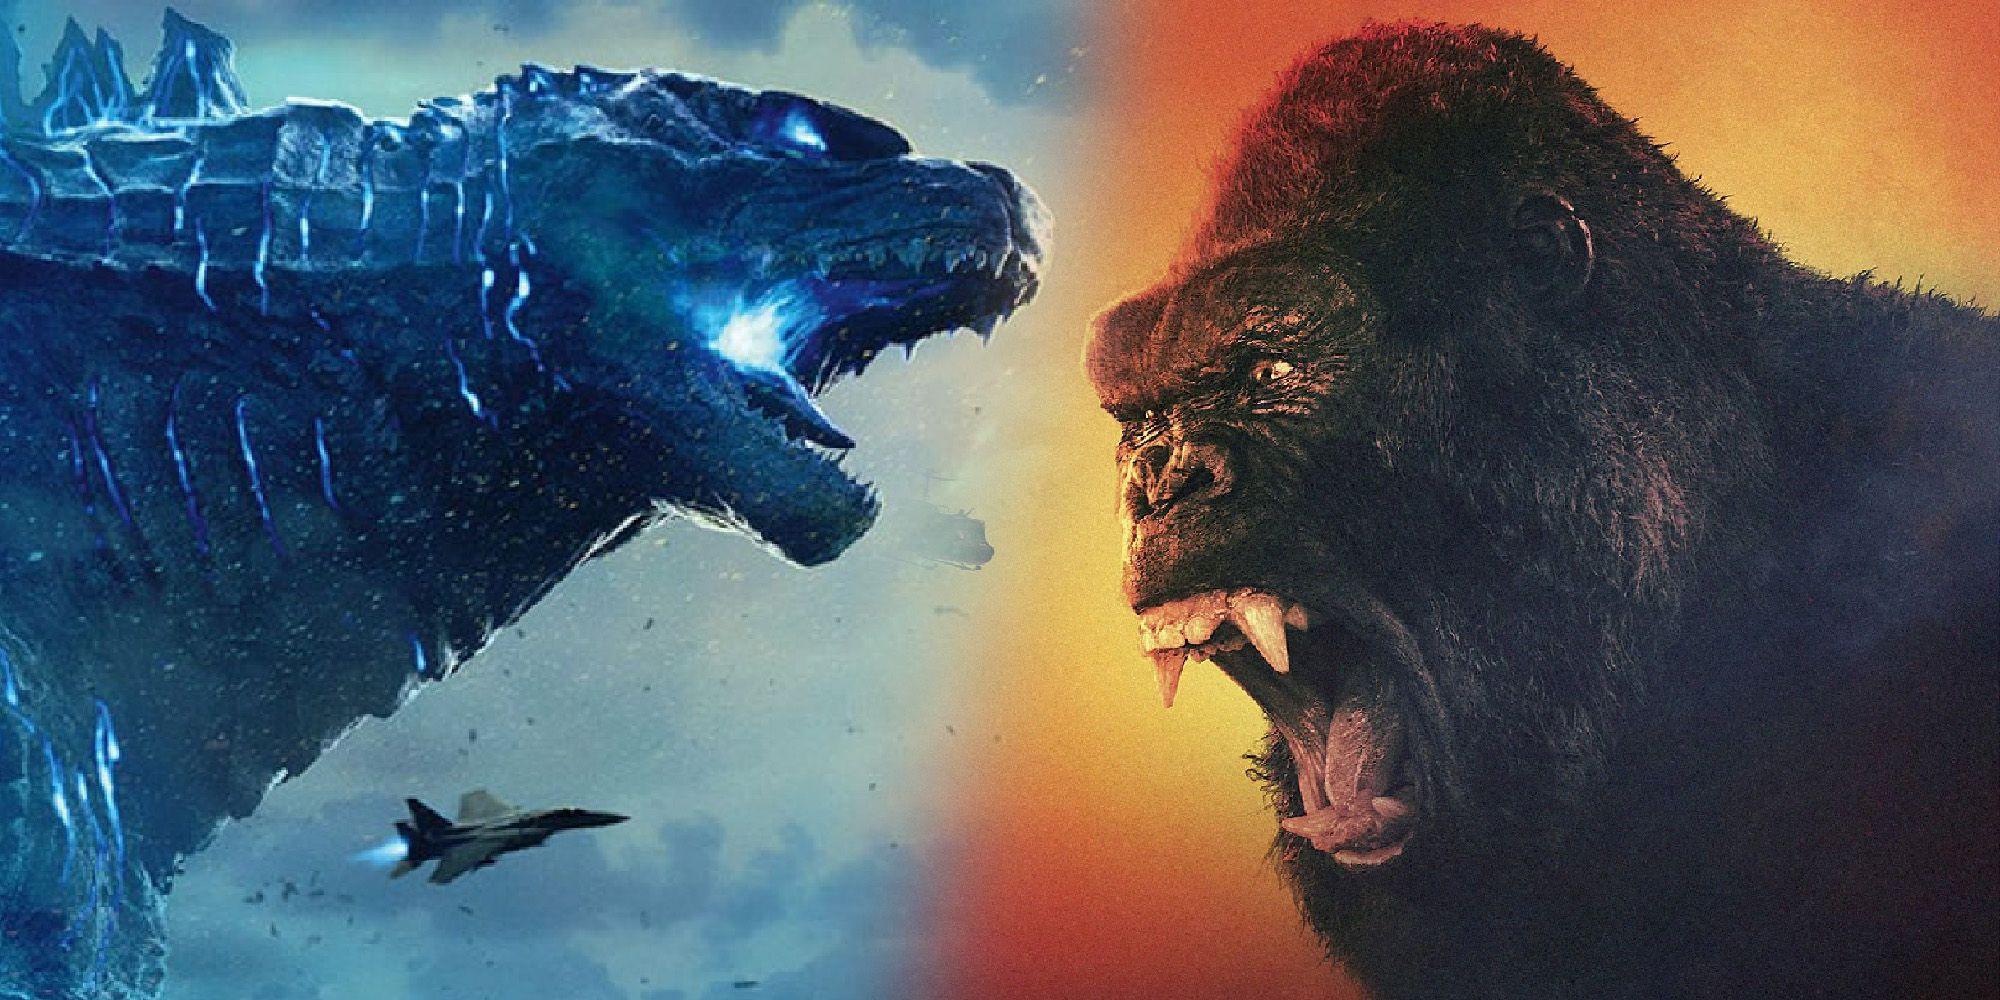 Godzilla vs Kong Primer Trailer